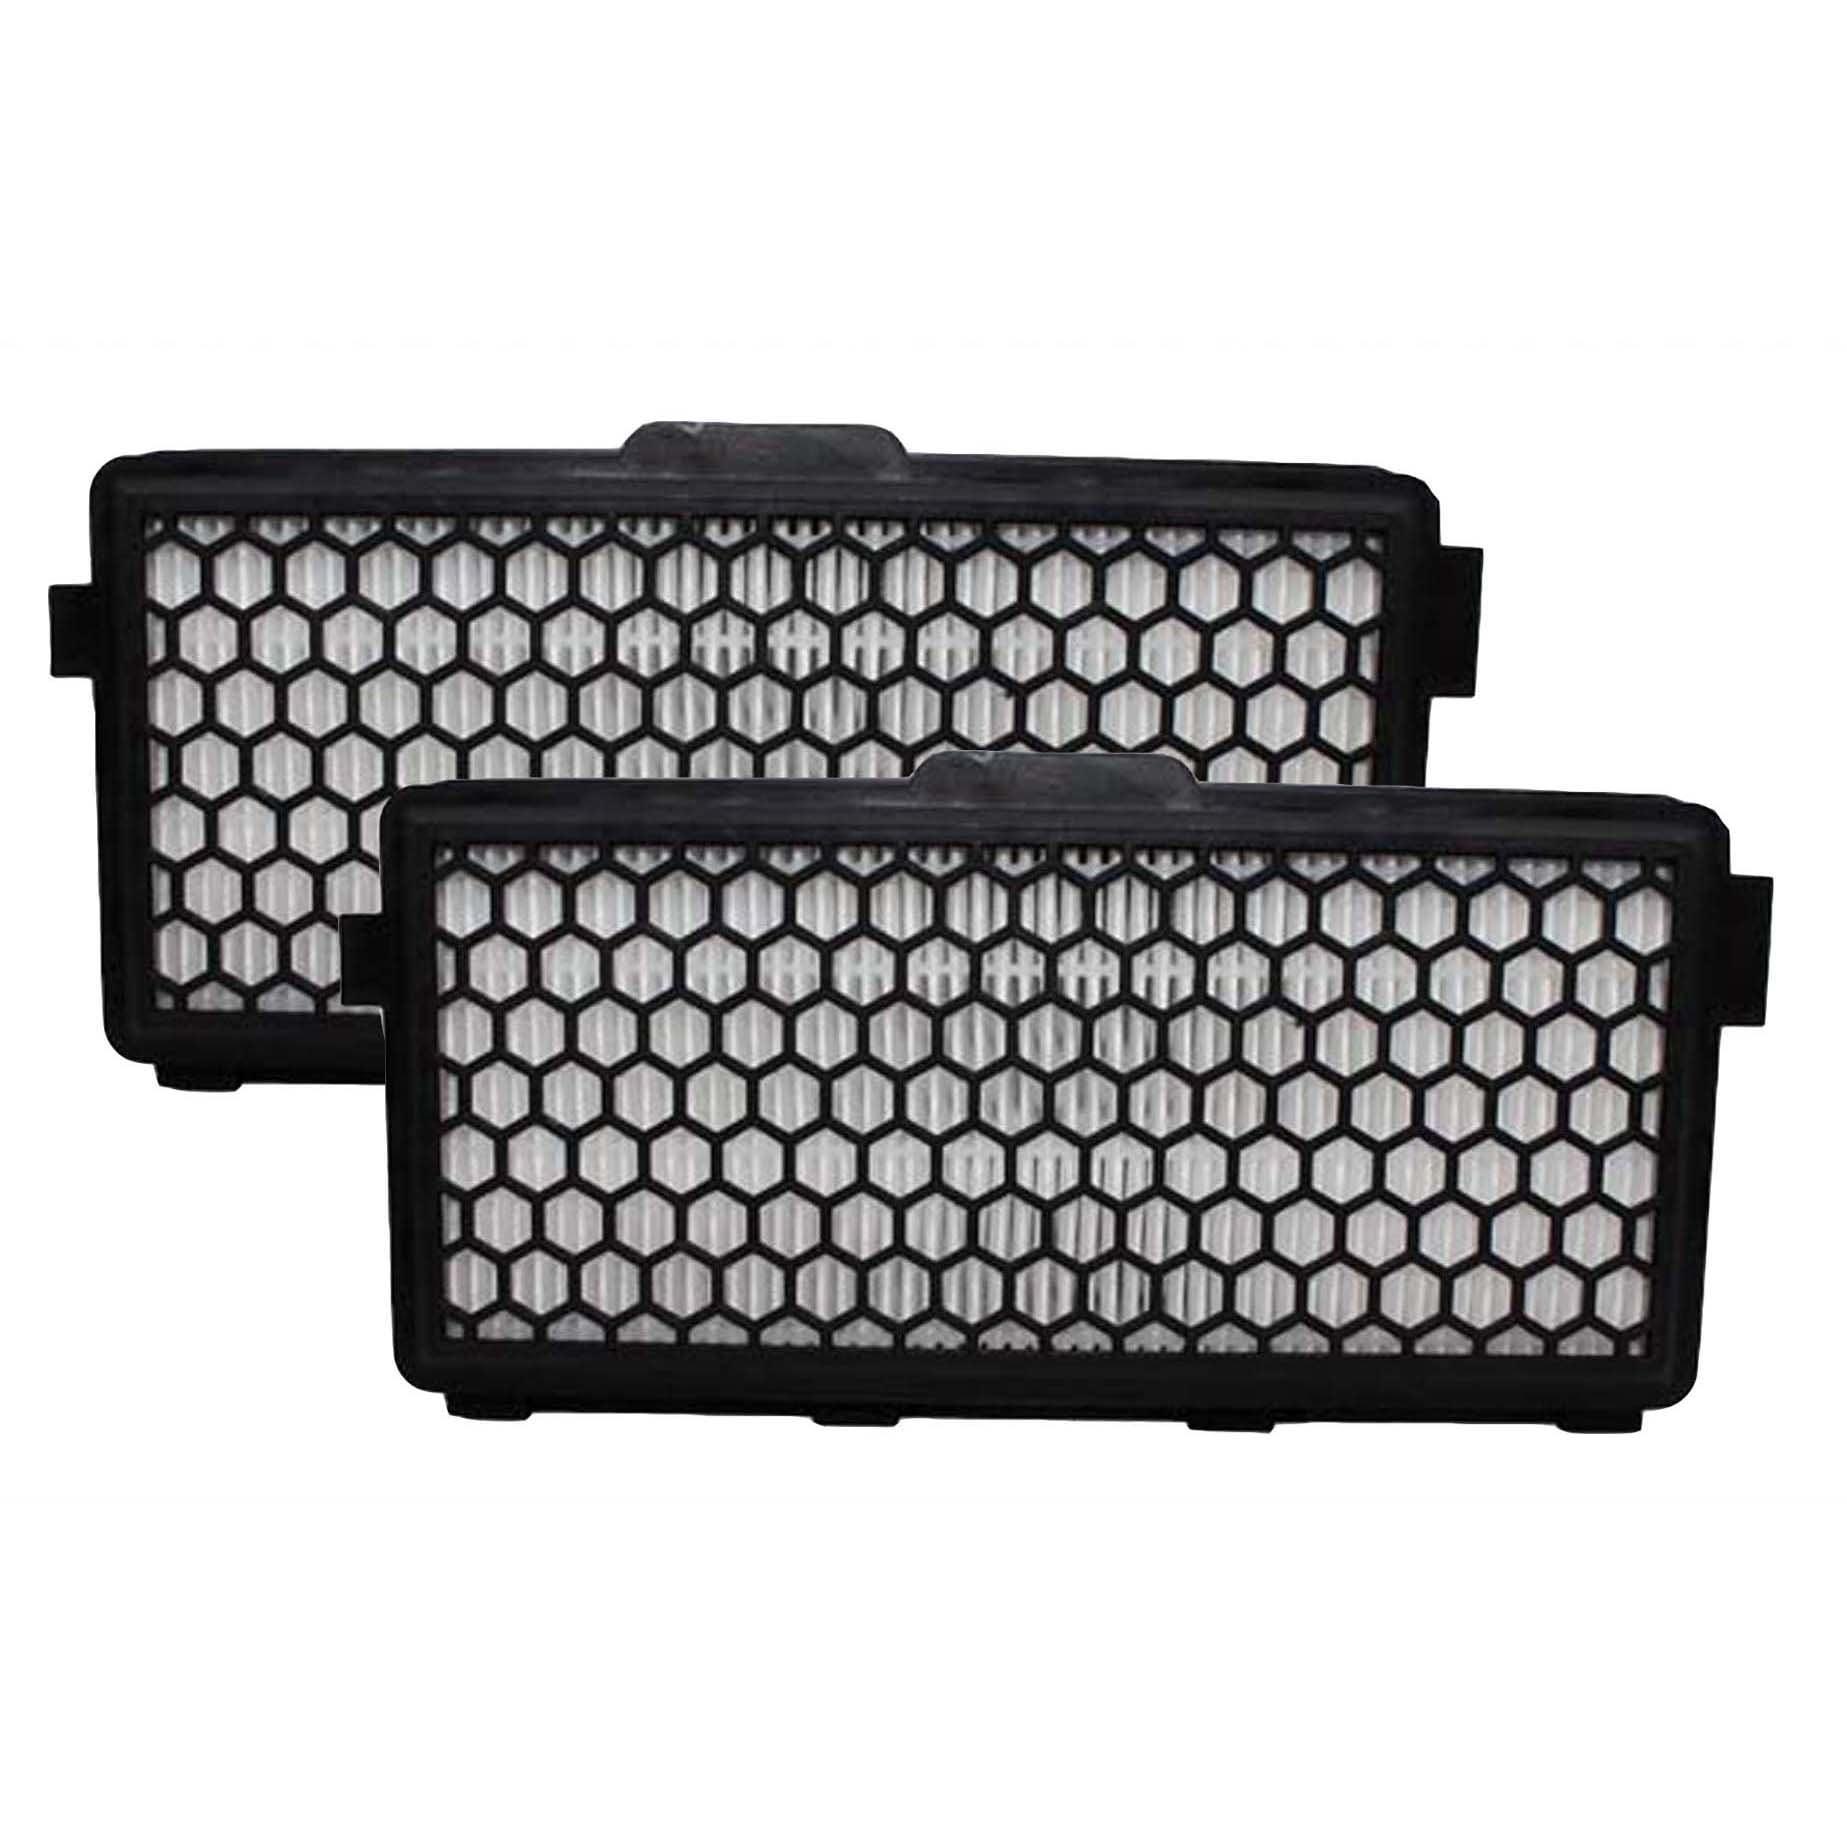 Crucial 2 Miele SF-AH50 S4000 Hepa Filters Part # 0599688...